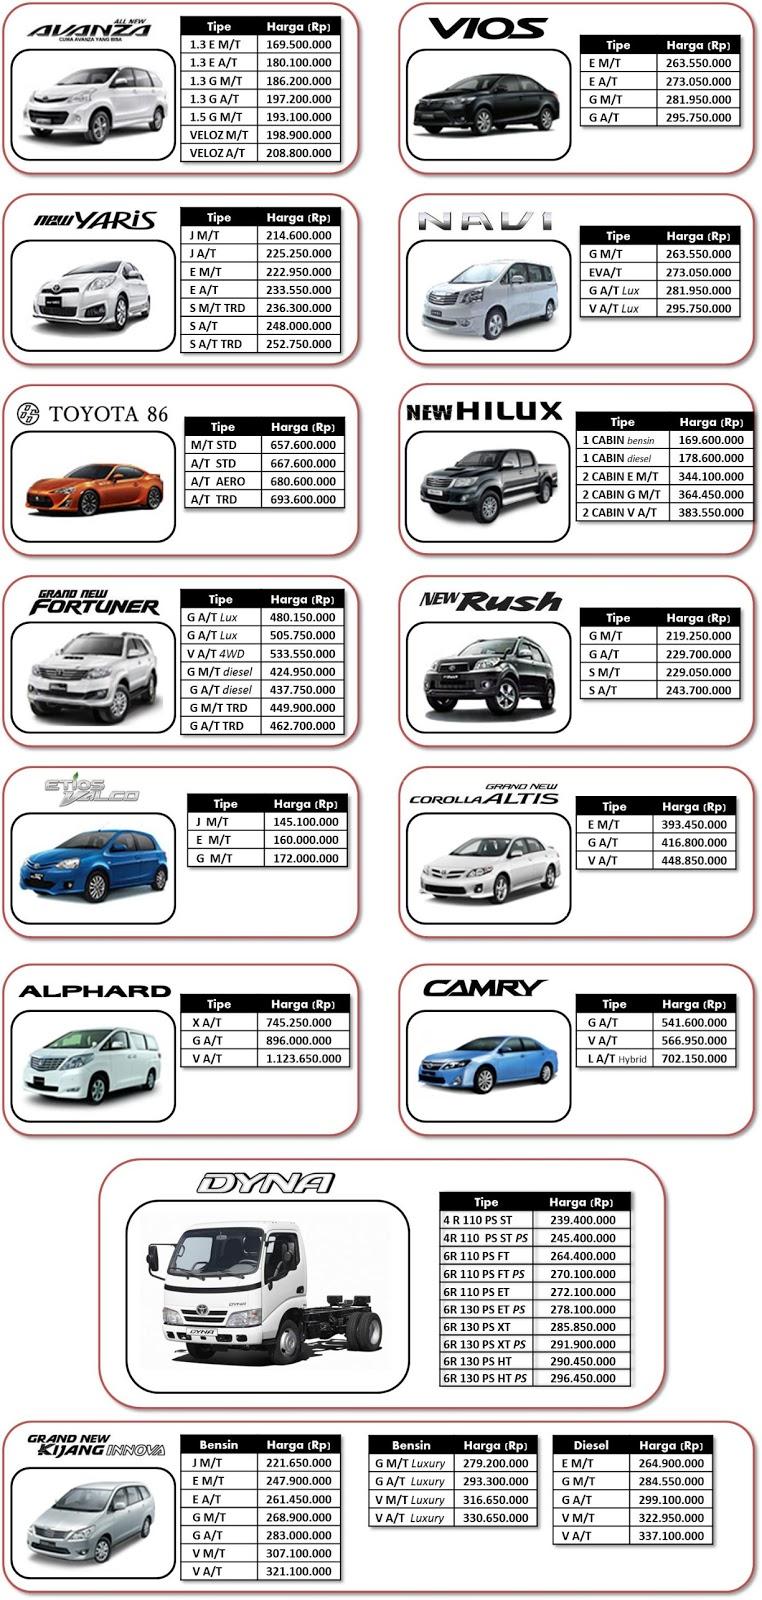 Kelebihan Daftar Harga Toyota Spesifikasi